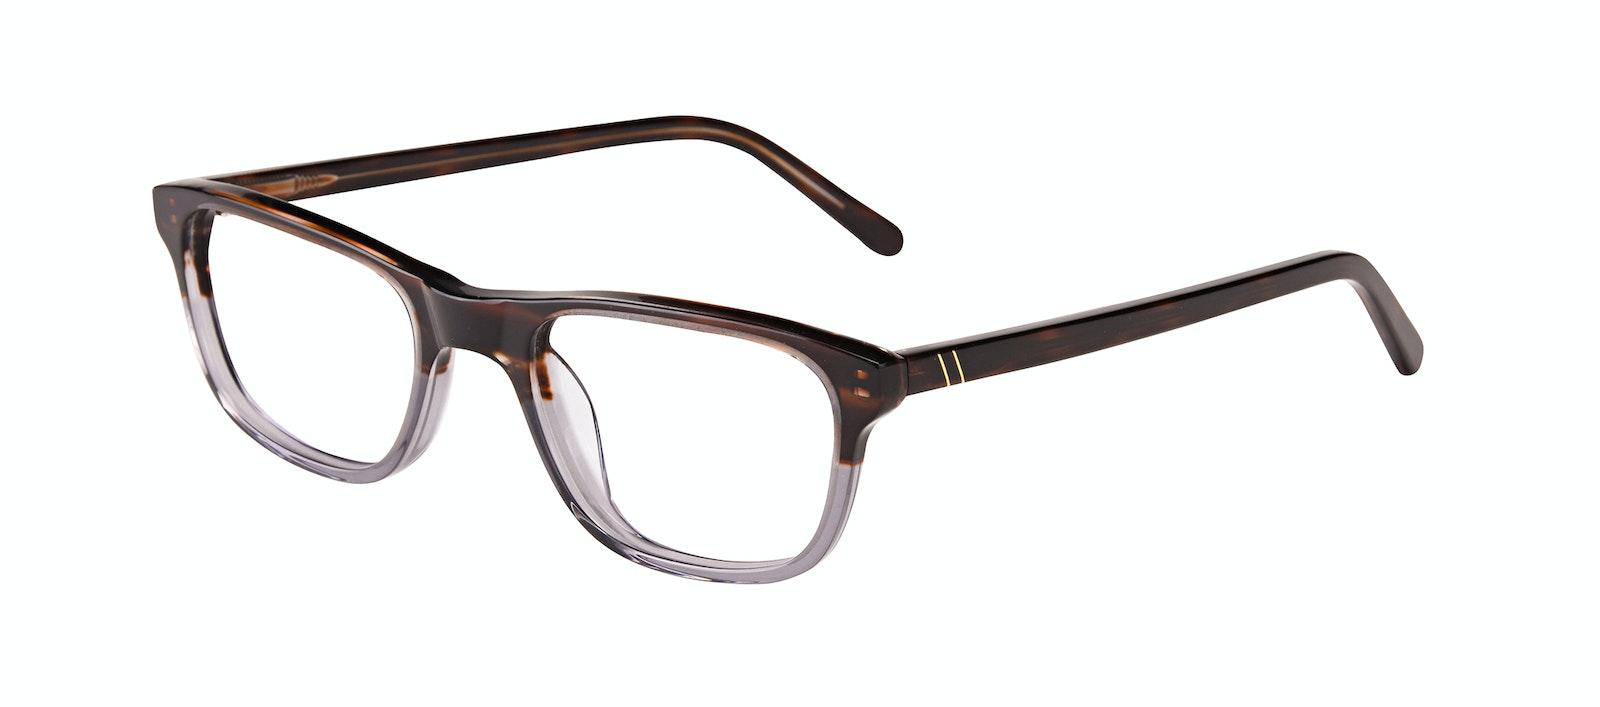 Affordable Fashion Glasses Rectangle Eyeglasses Men Neat Storm Tilt